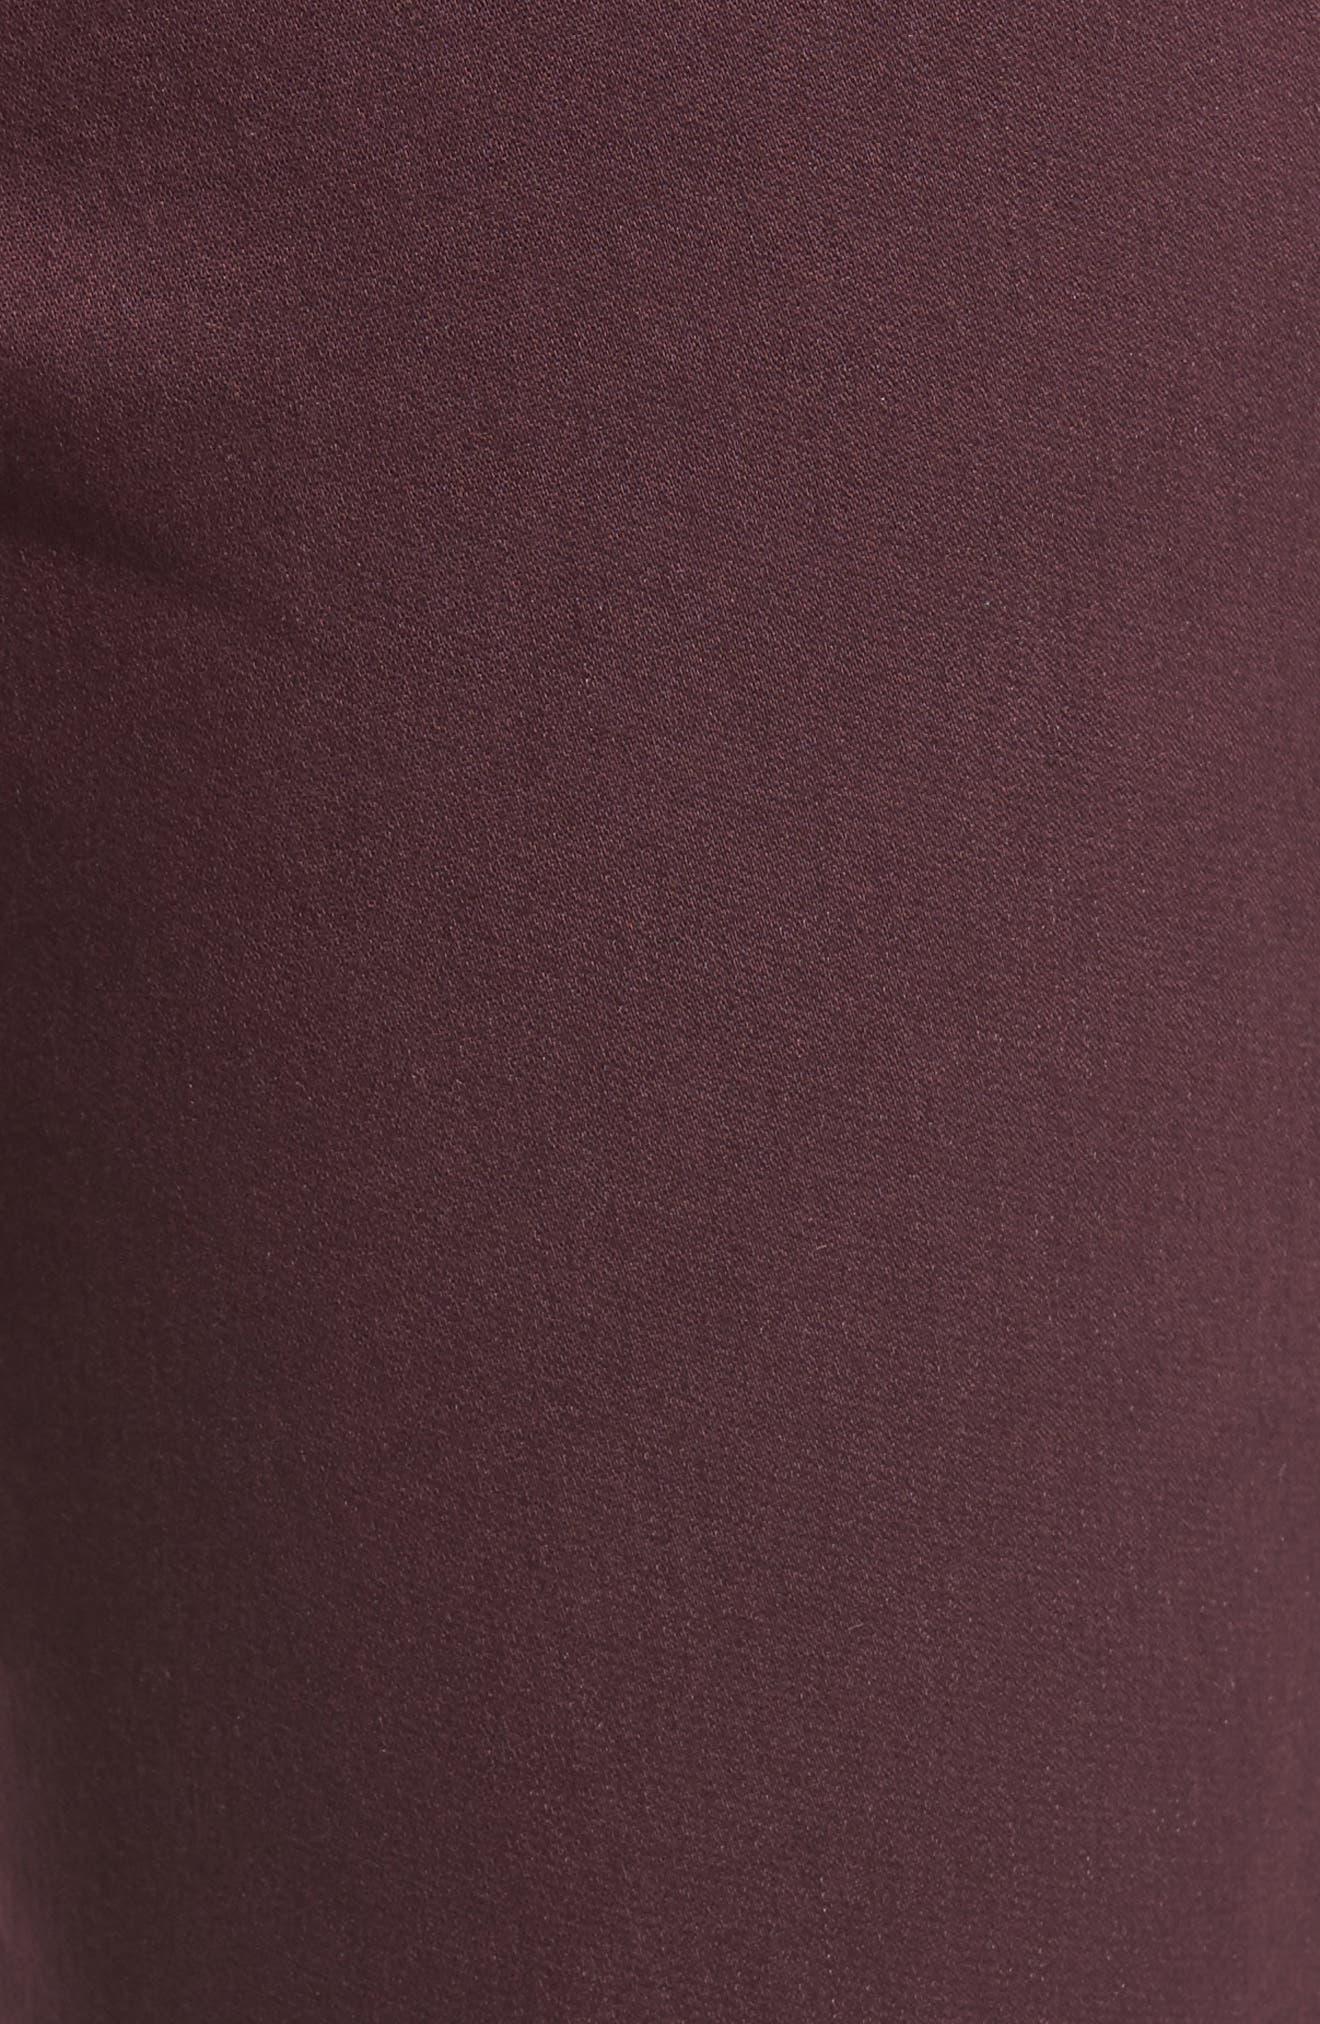 Ryan Knit Skinny Jeans,                             Alternate thumbnail 5, color,                             575